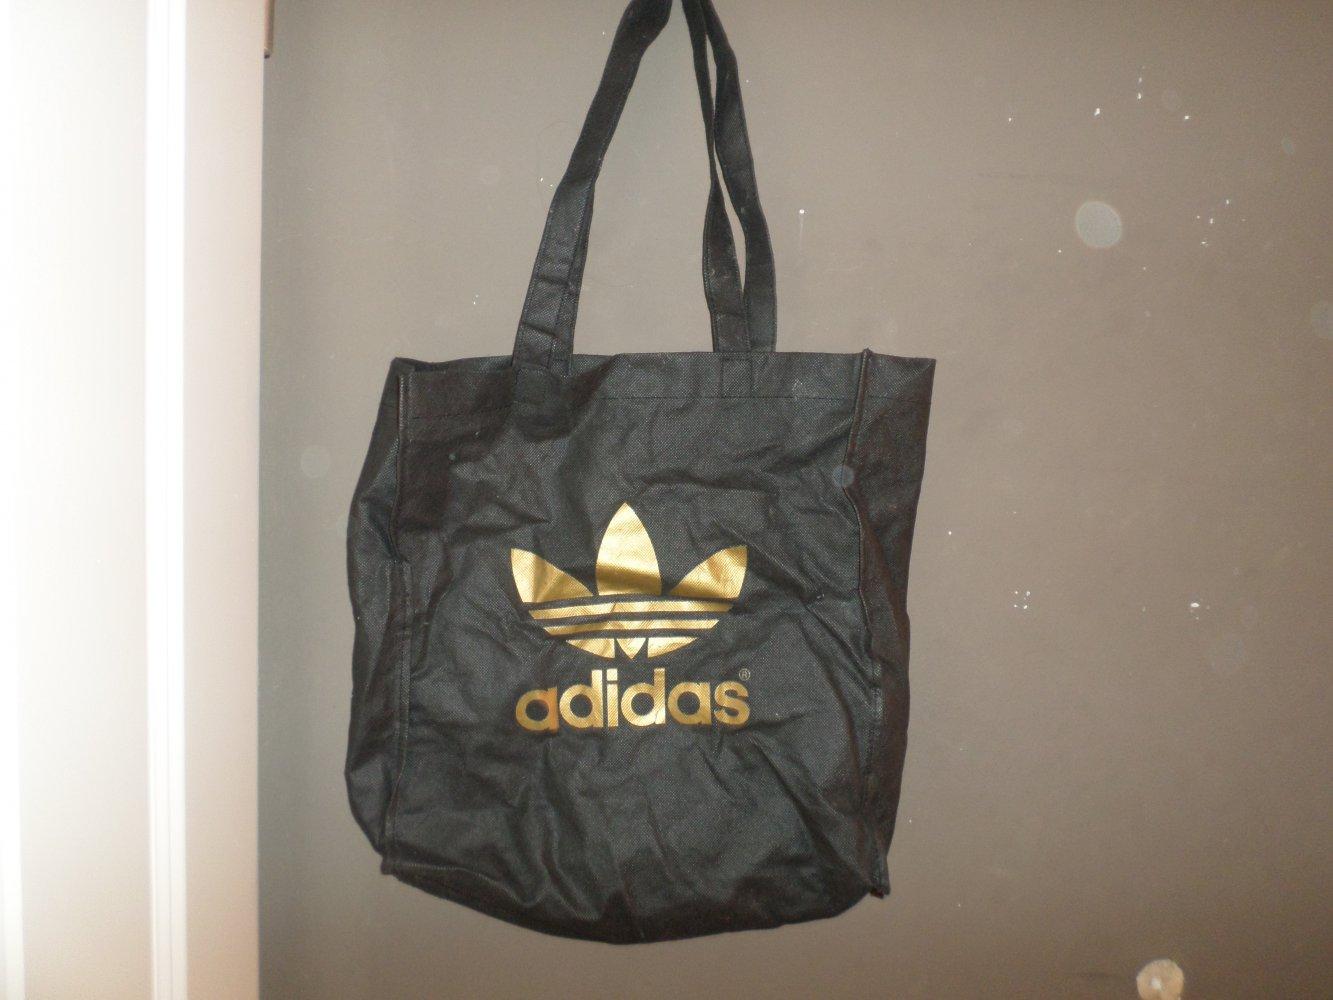 099aa1db00410 Adidas Stoff Tasche    Kleiderkorb.at